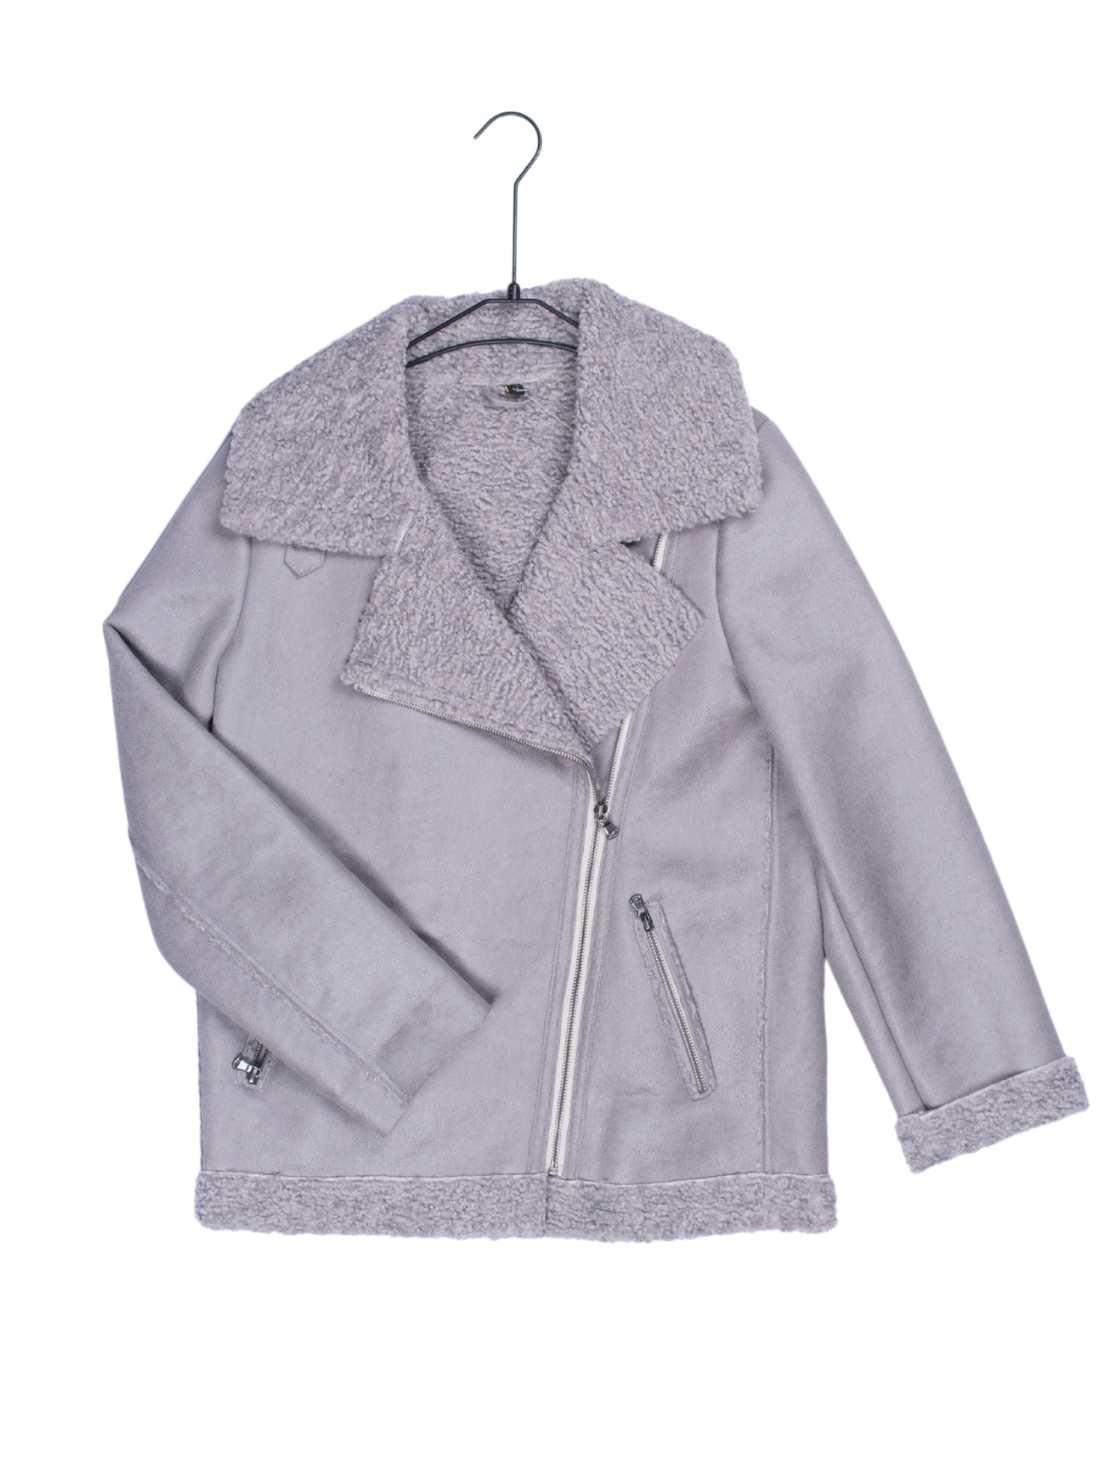 Ladies Heavy Suede Fabric Jacket